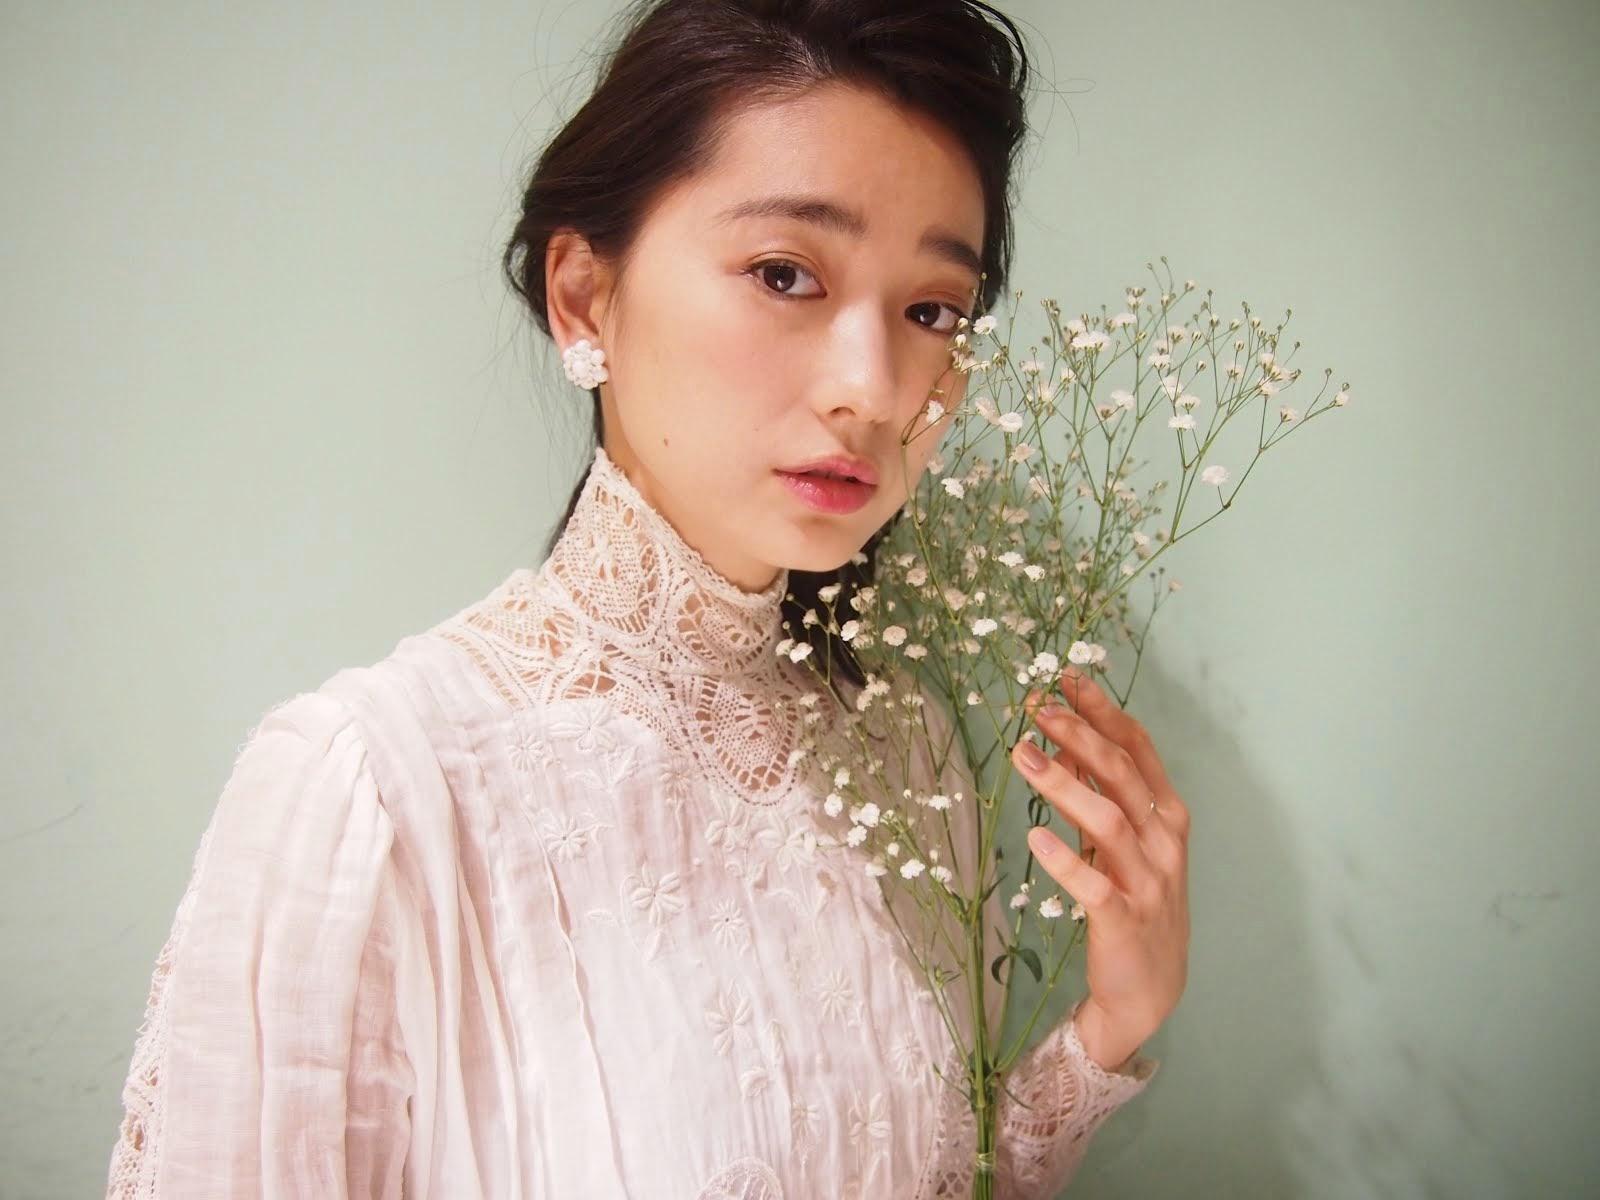 Chisato Matsunaga